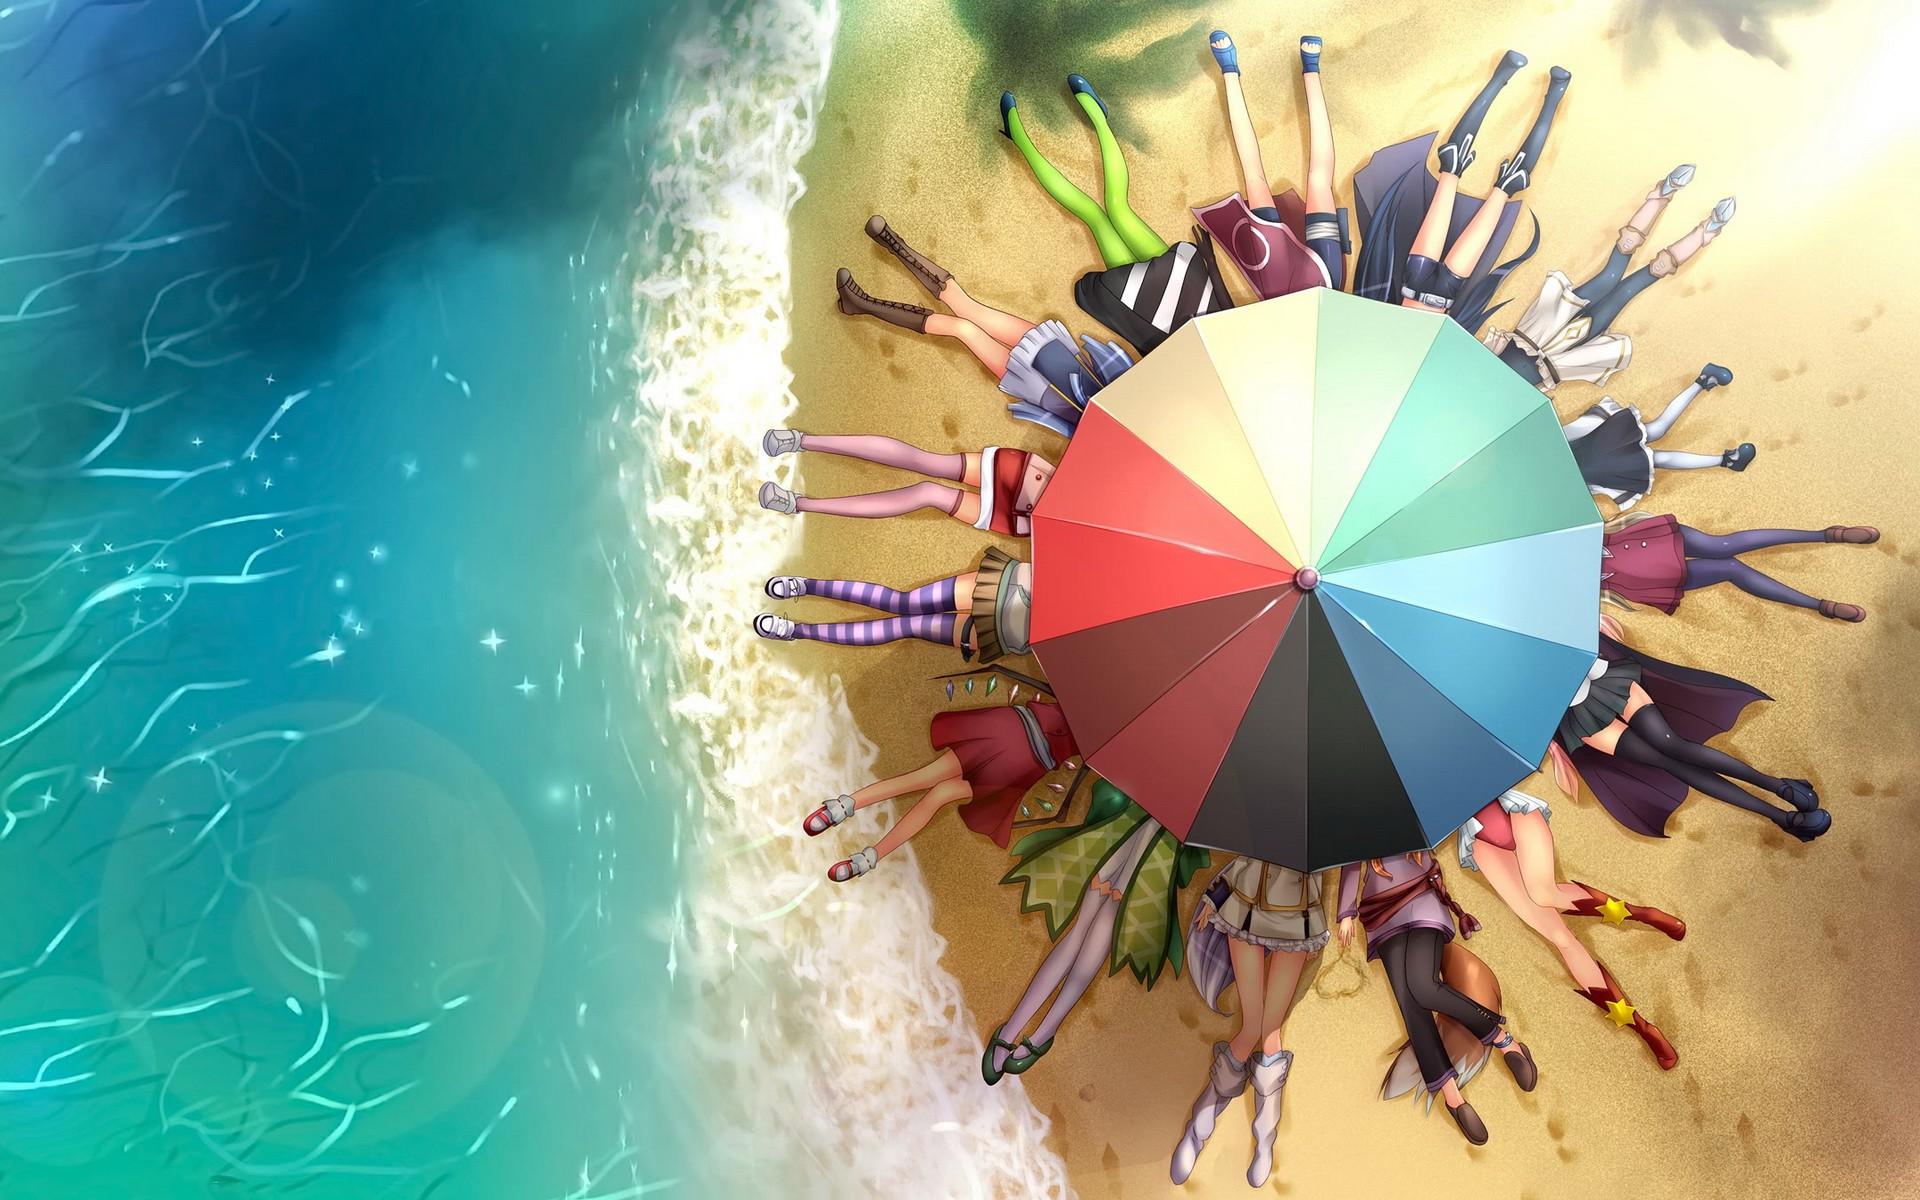 Legs beach seas anime umbrellas soft shading wallpaper | 1920x1200